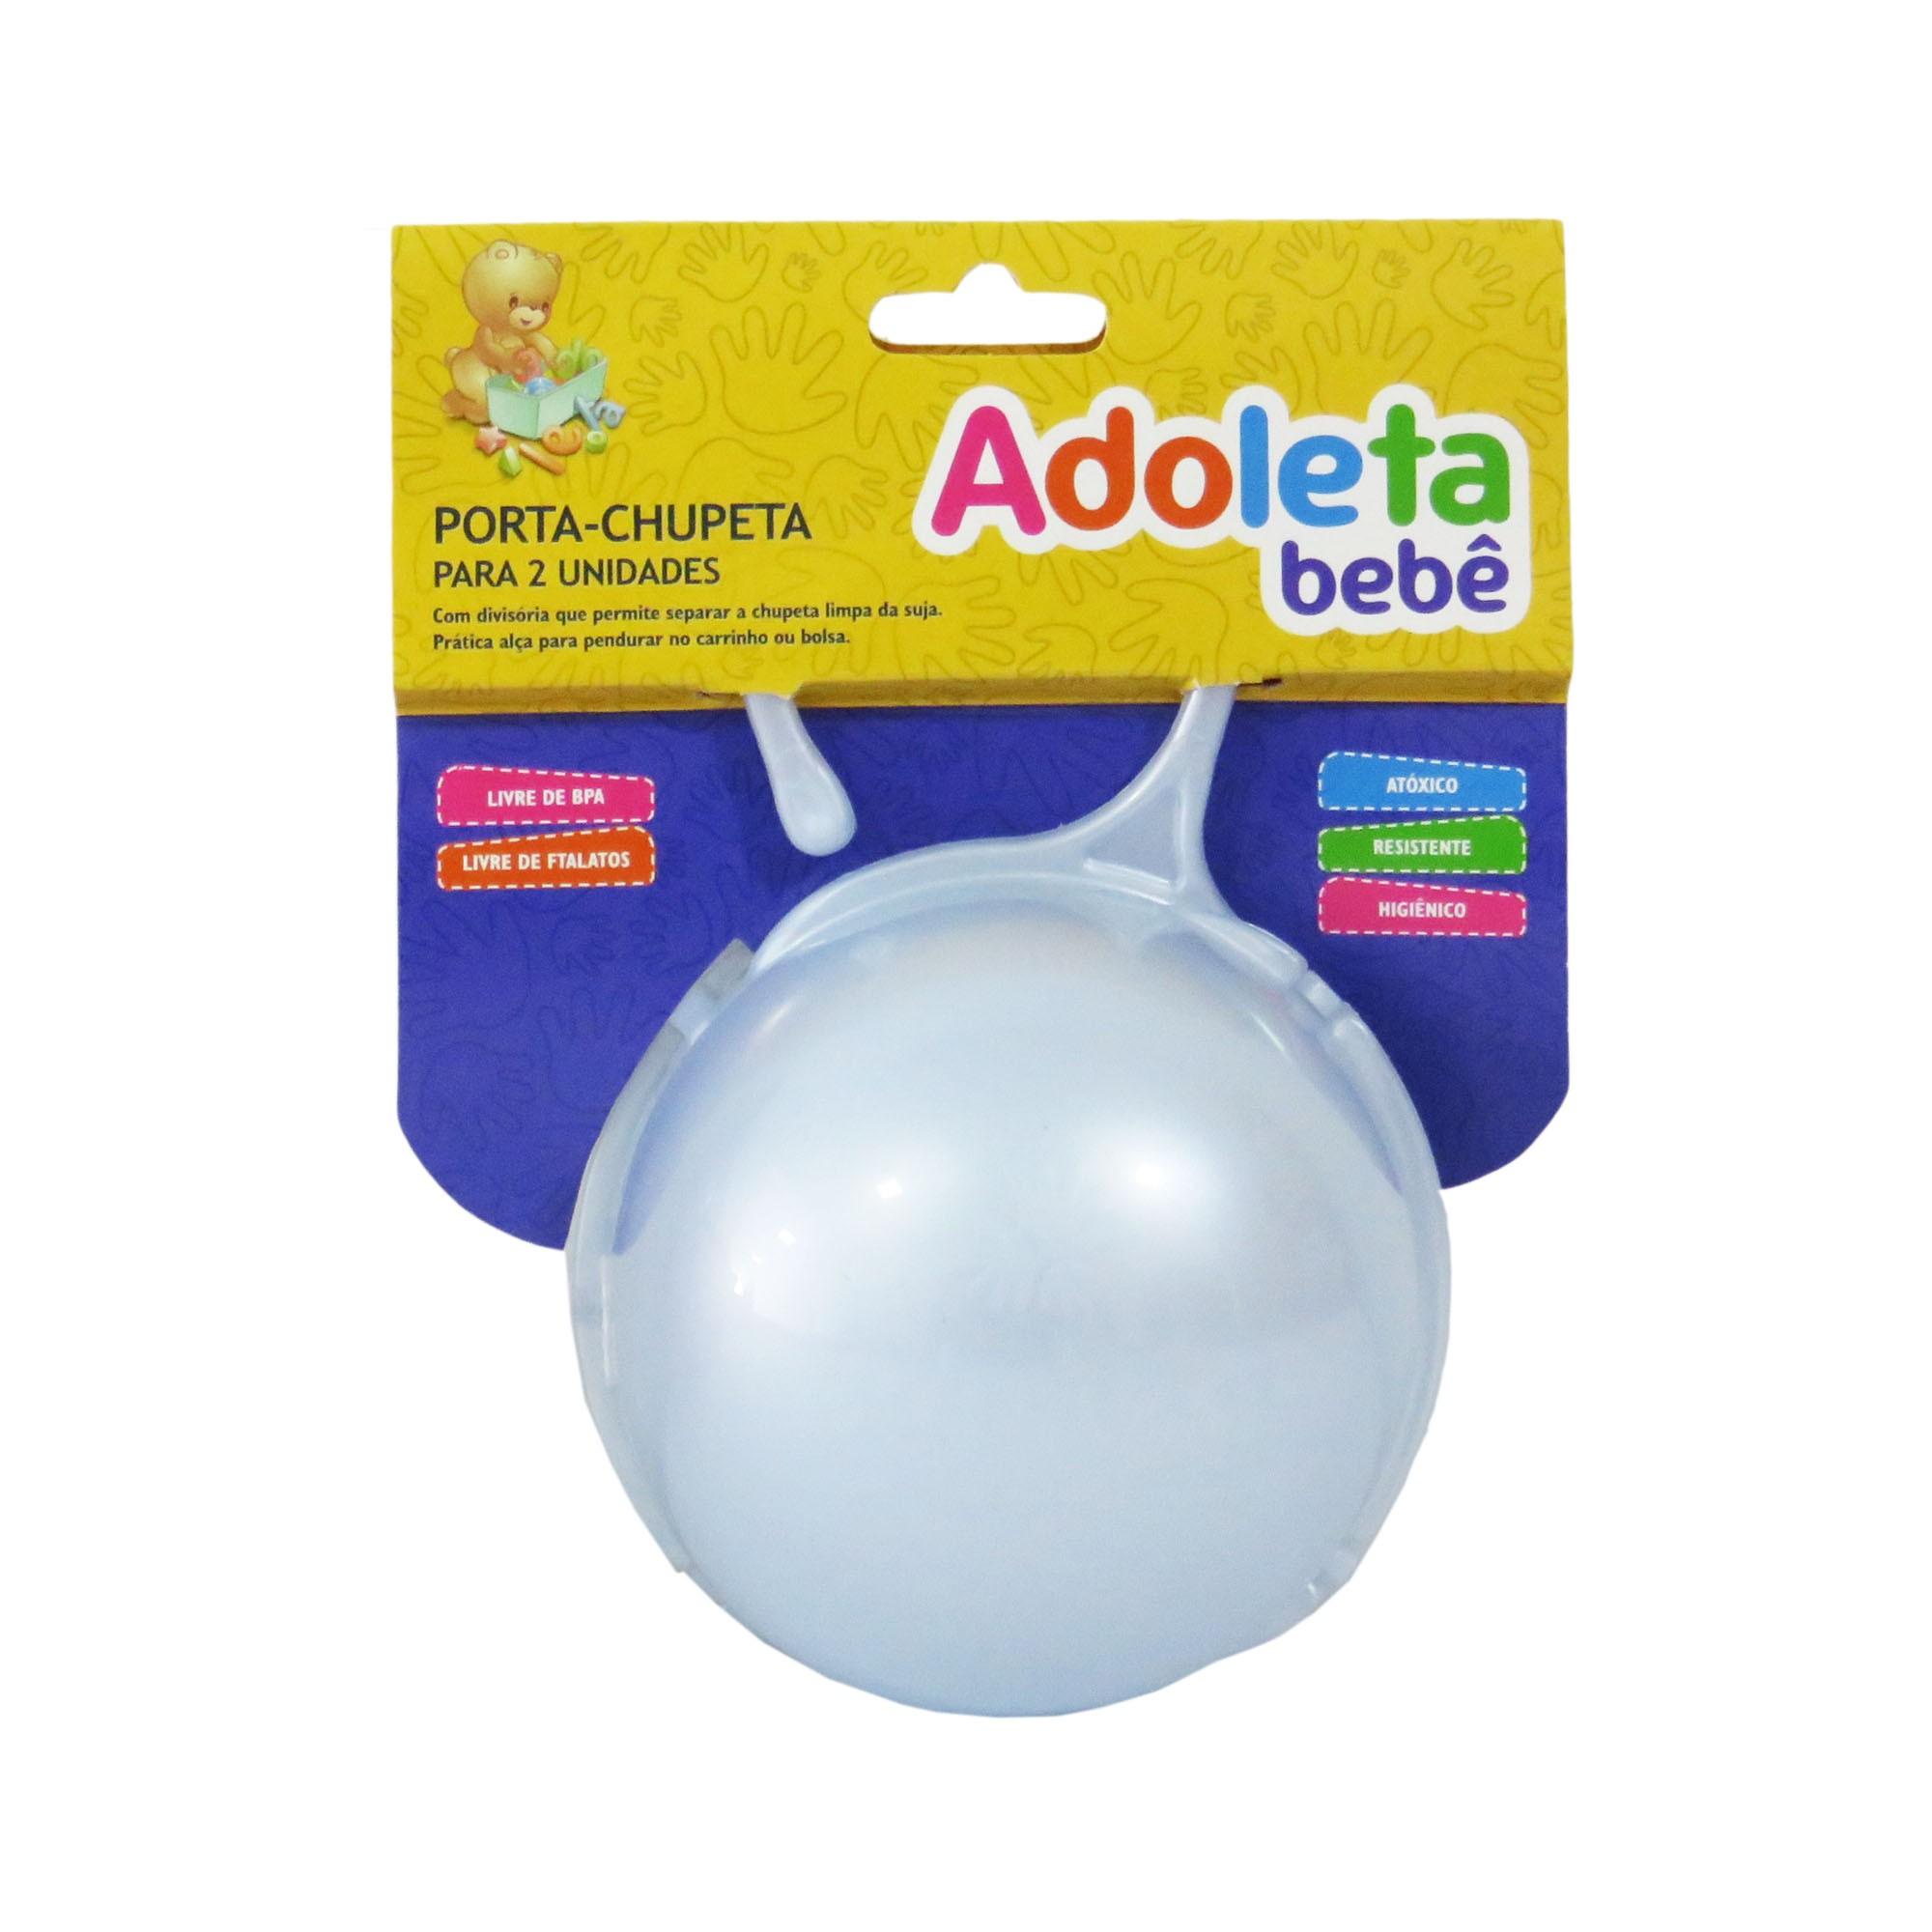 Porta-Chupeta Cajovil Adoleta - Para 2 Unidades - Azul